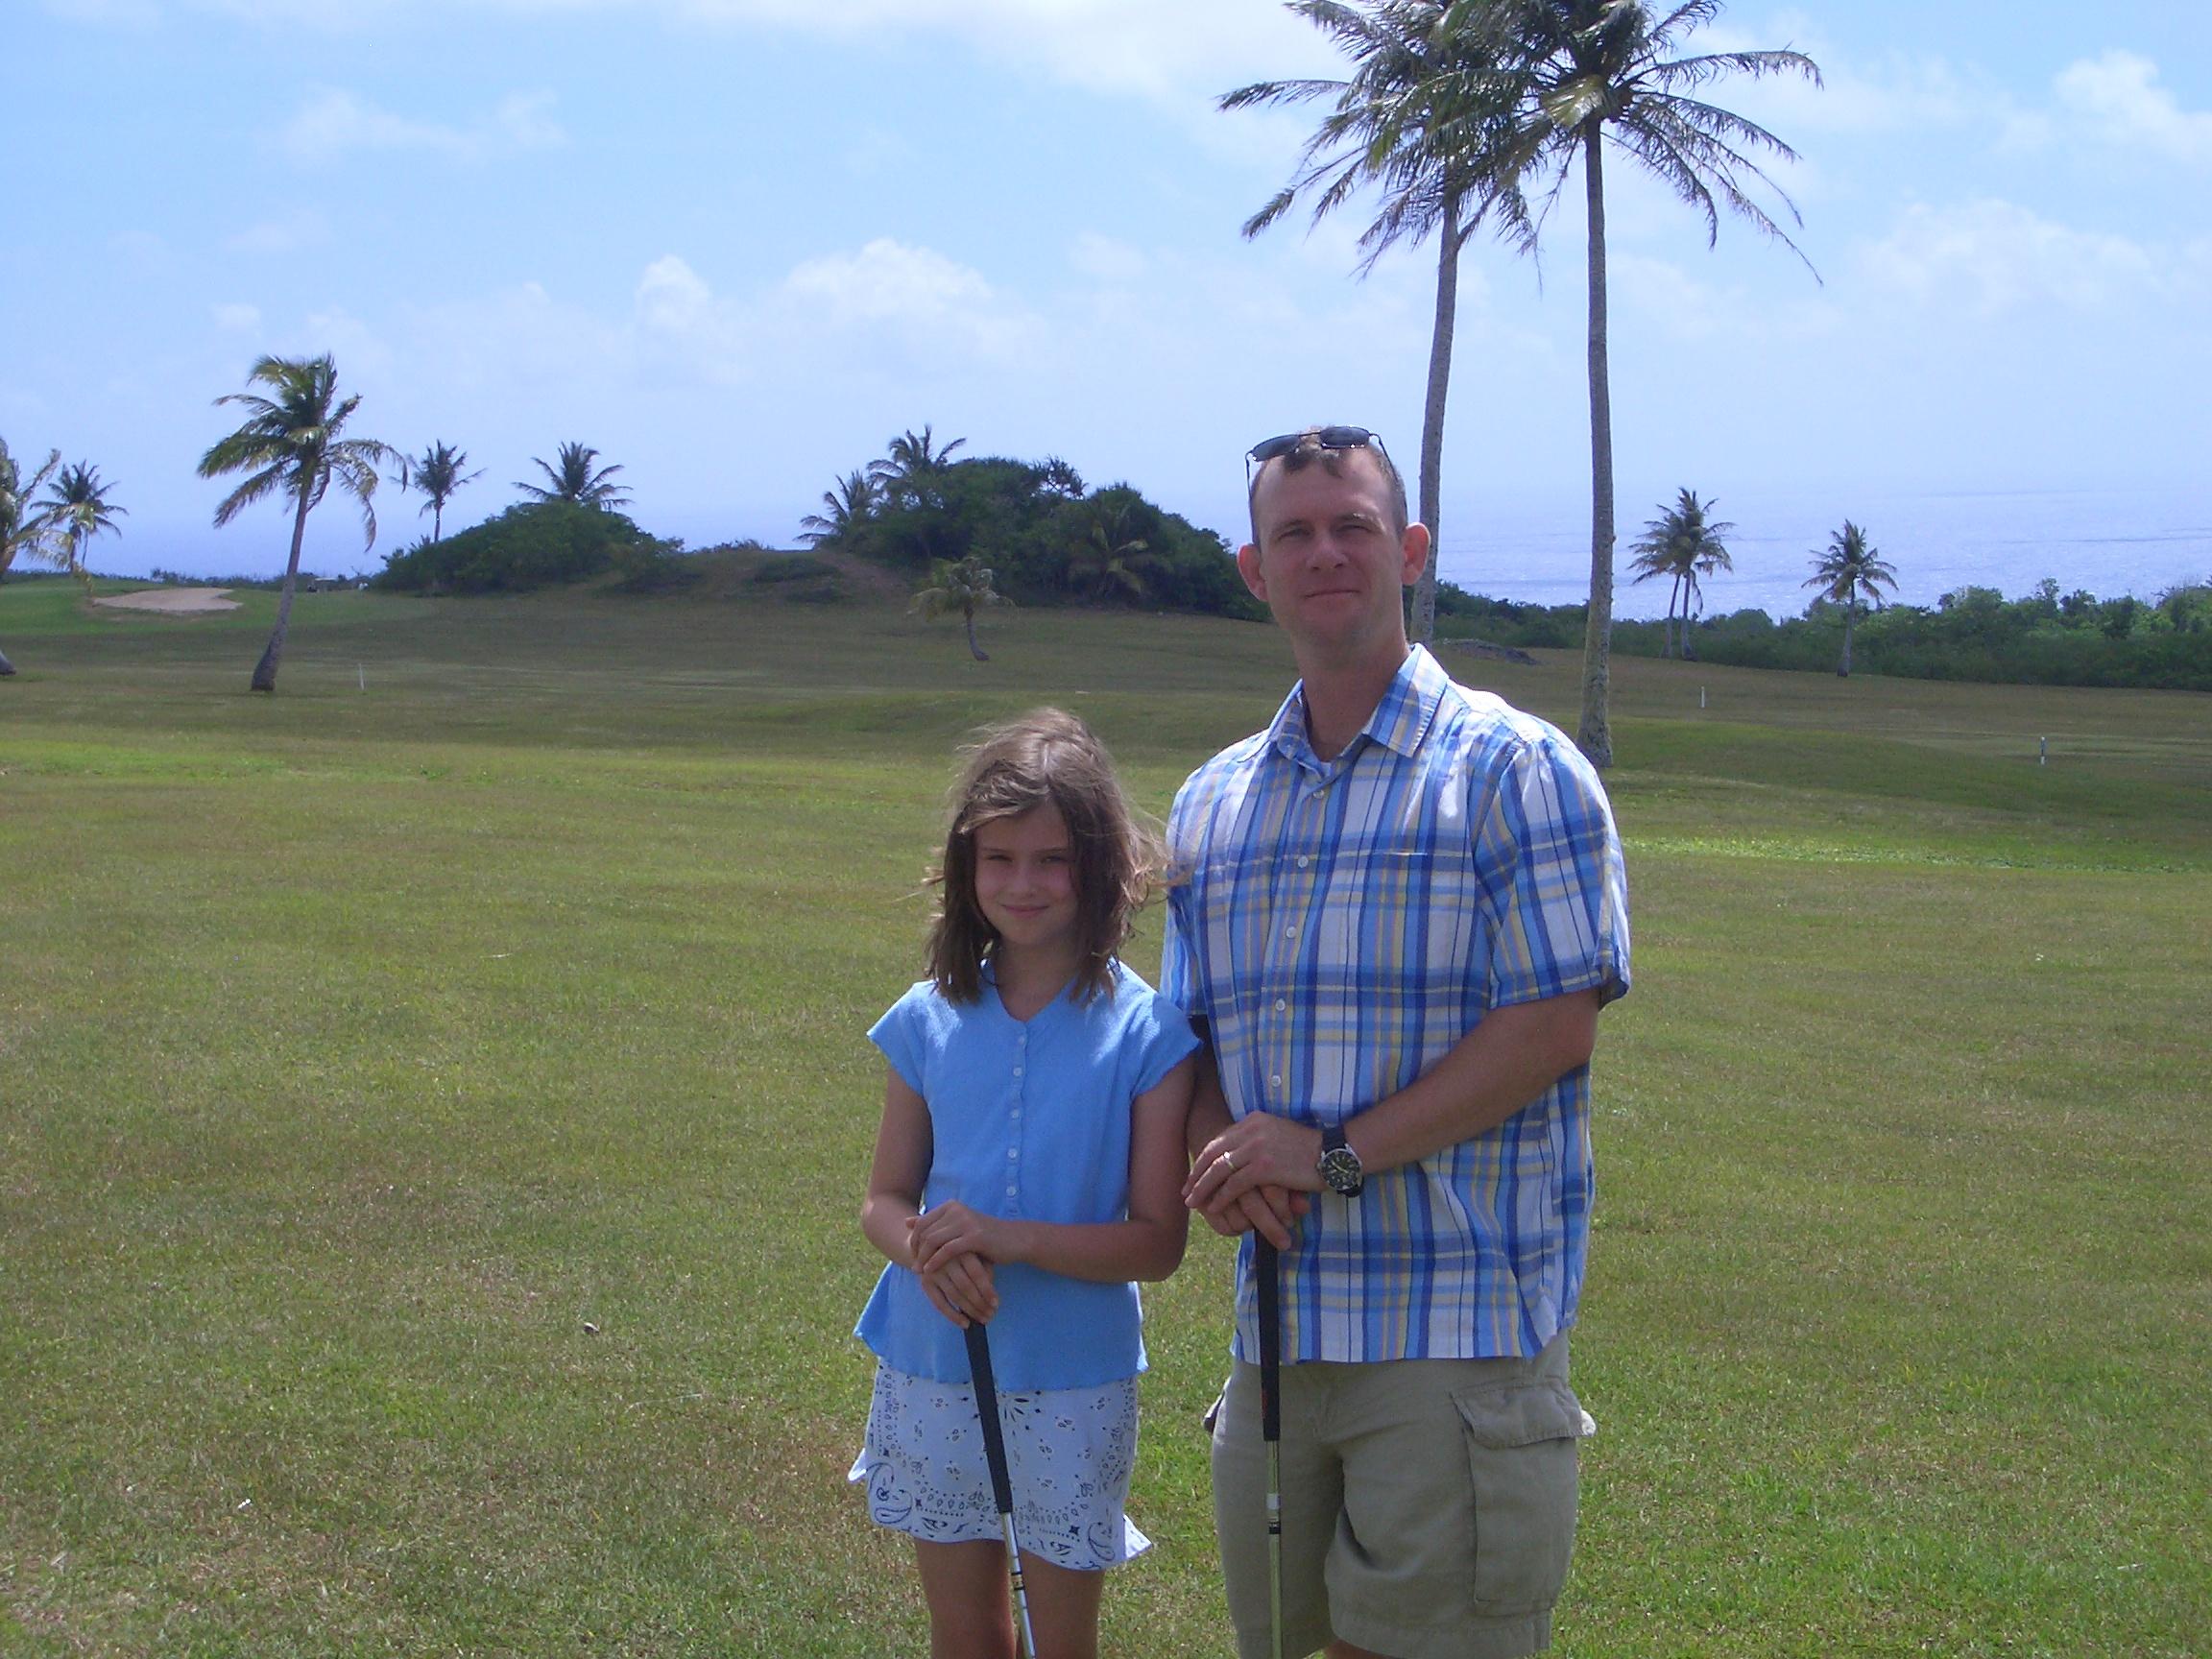 fm-fg-on-golf-course-andersen-afb-guam-june-06.JPG